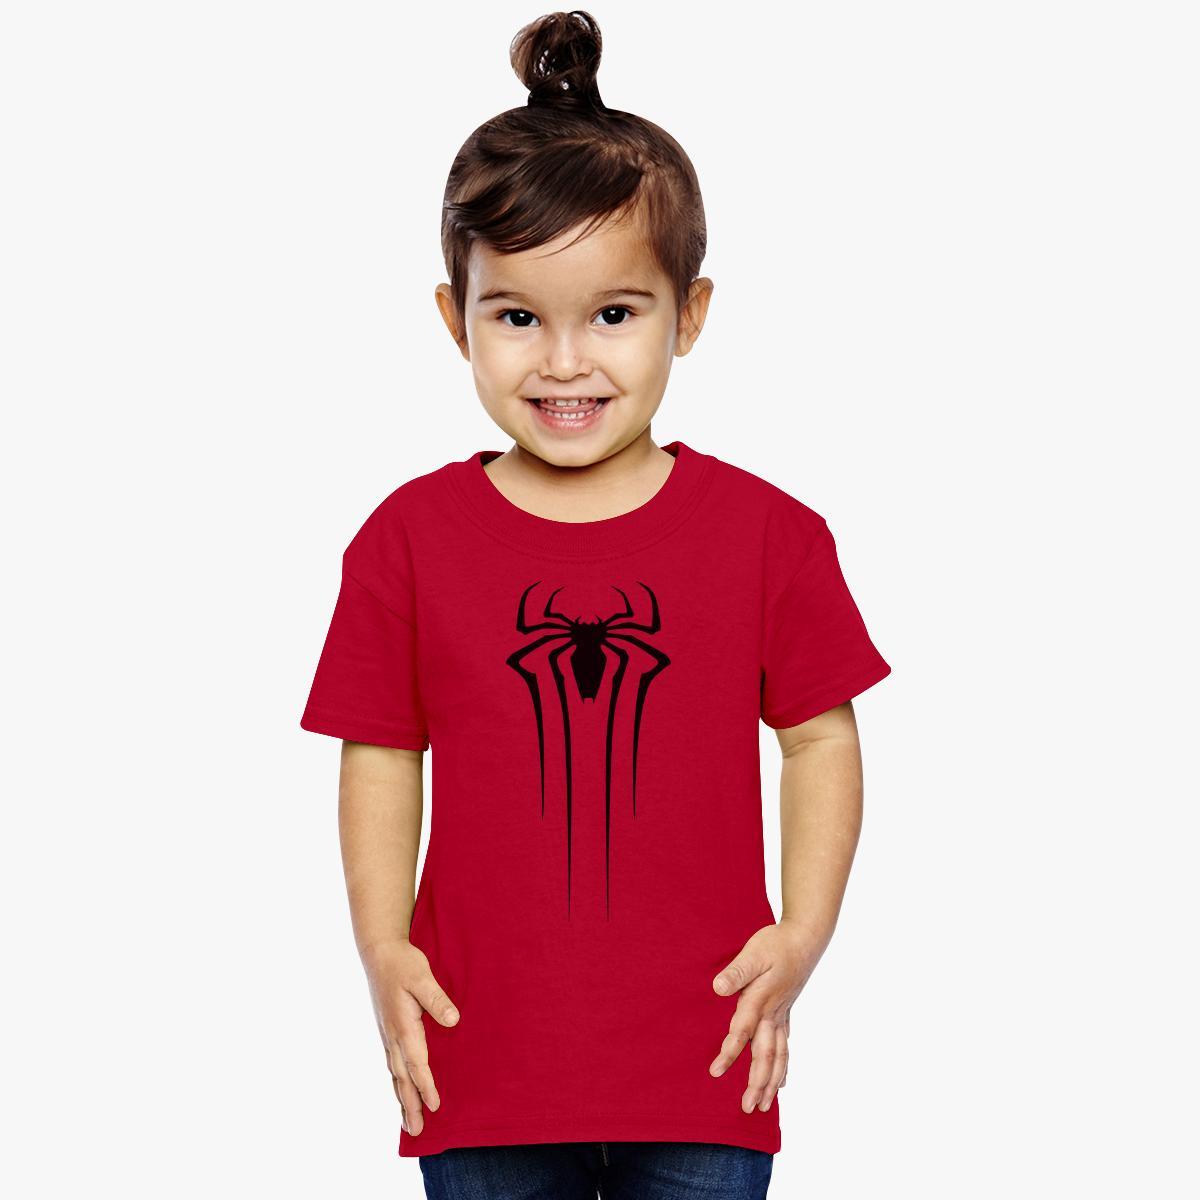 Spider-Man Toddler T-shirt